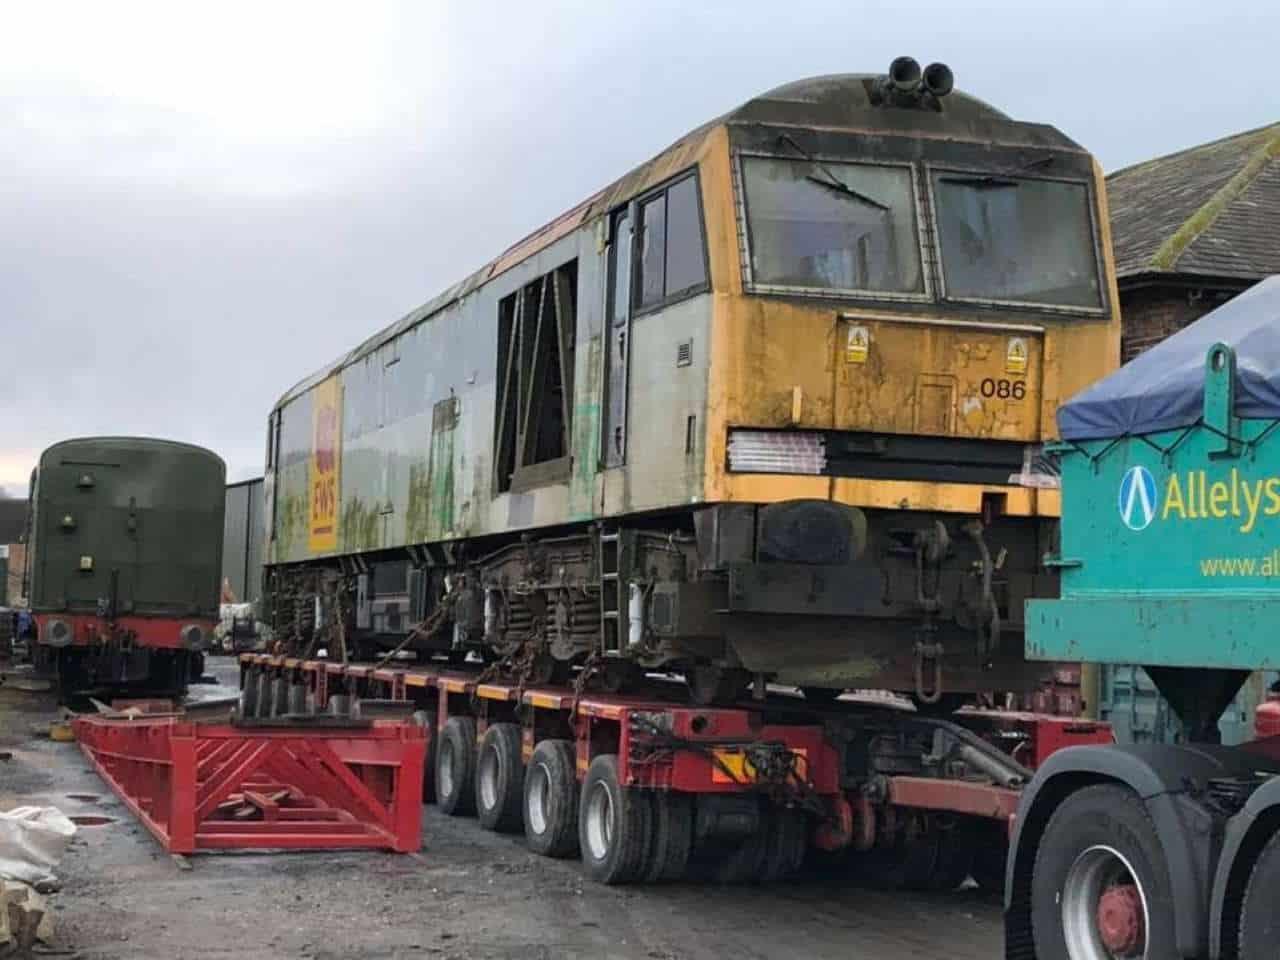 Class 60 diesel locomotive No. 60086 arrives at the Wensleydale Railway